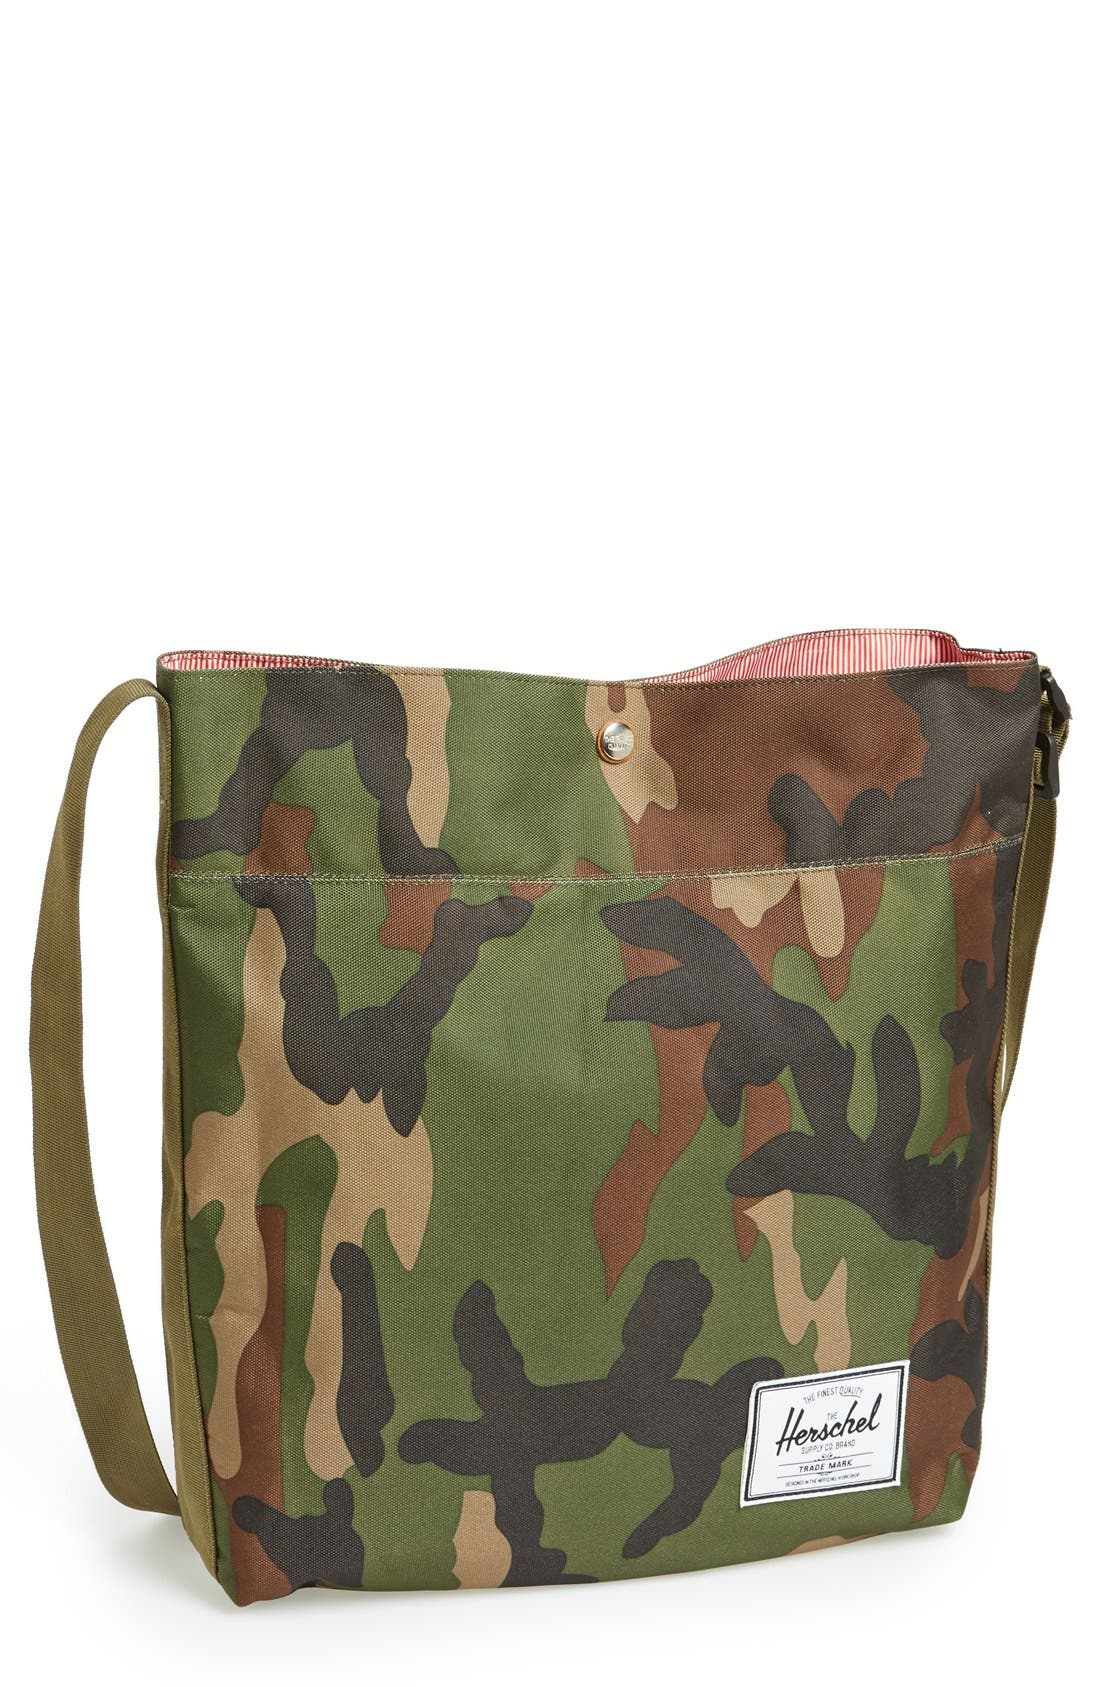 Main Image - Herschel Supply Co. 'Ottawa' Camo Tote Bag